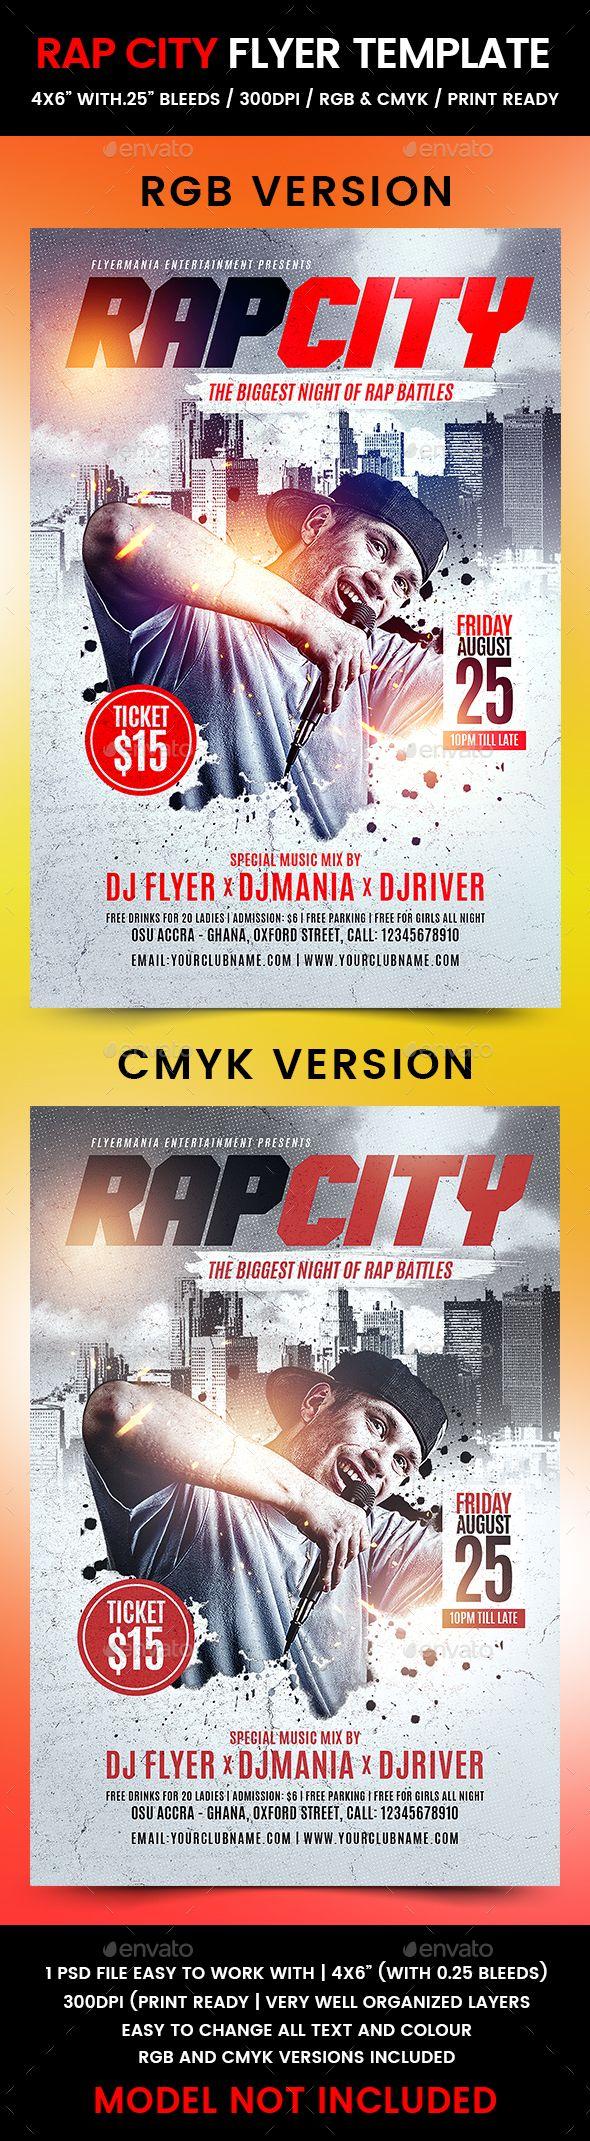 Rap City Flyer Template PSD